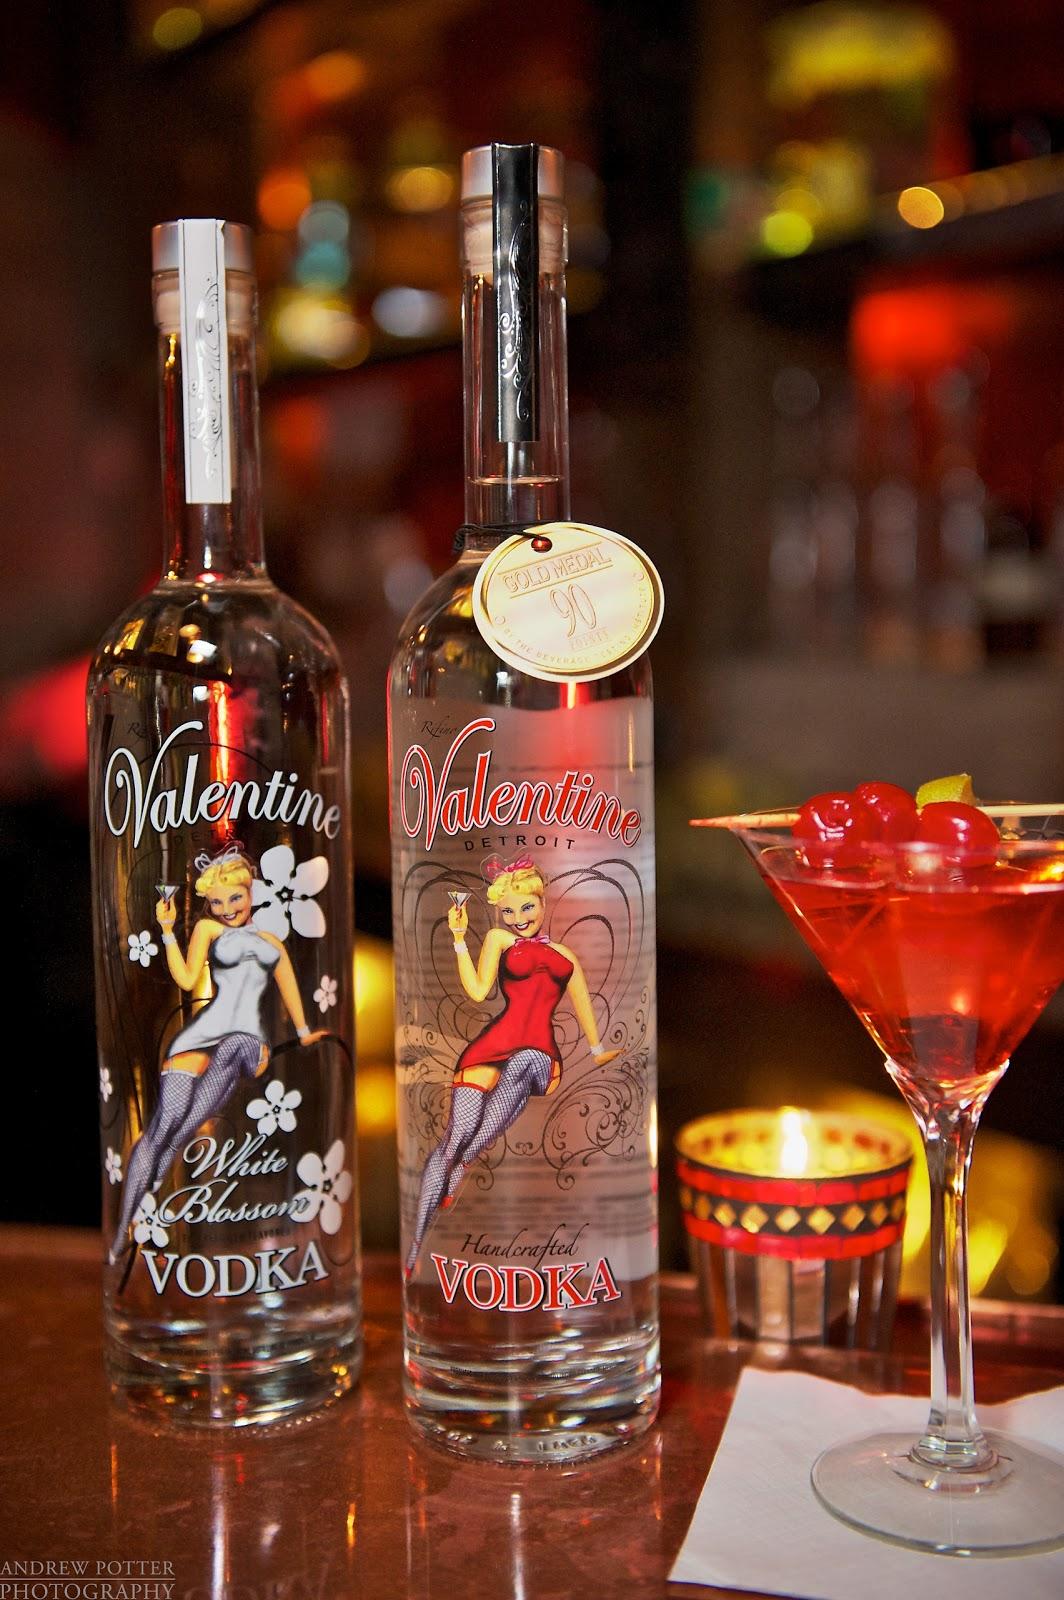 andrew potter photo blog - Valentines Vodka